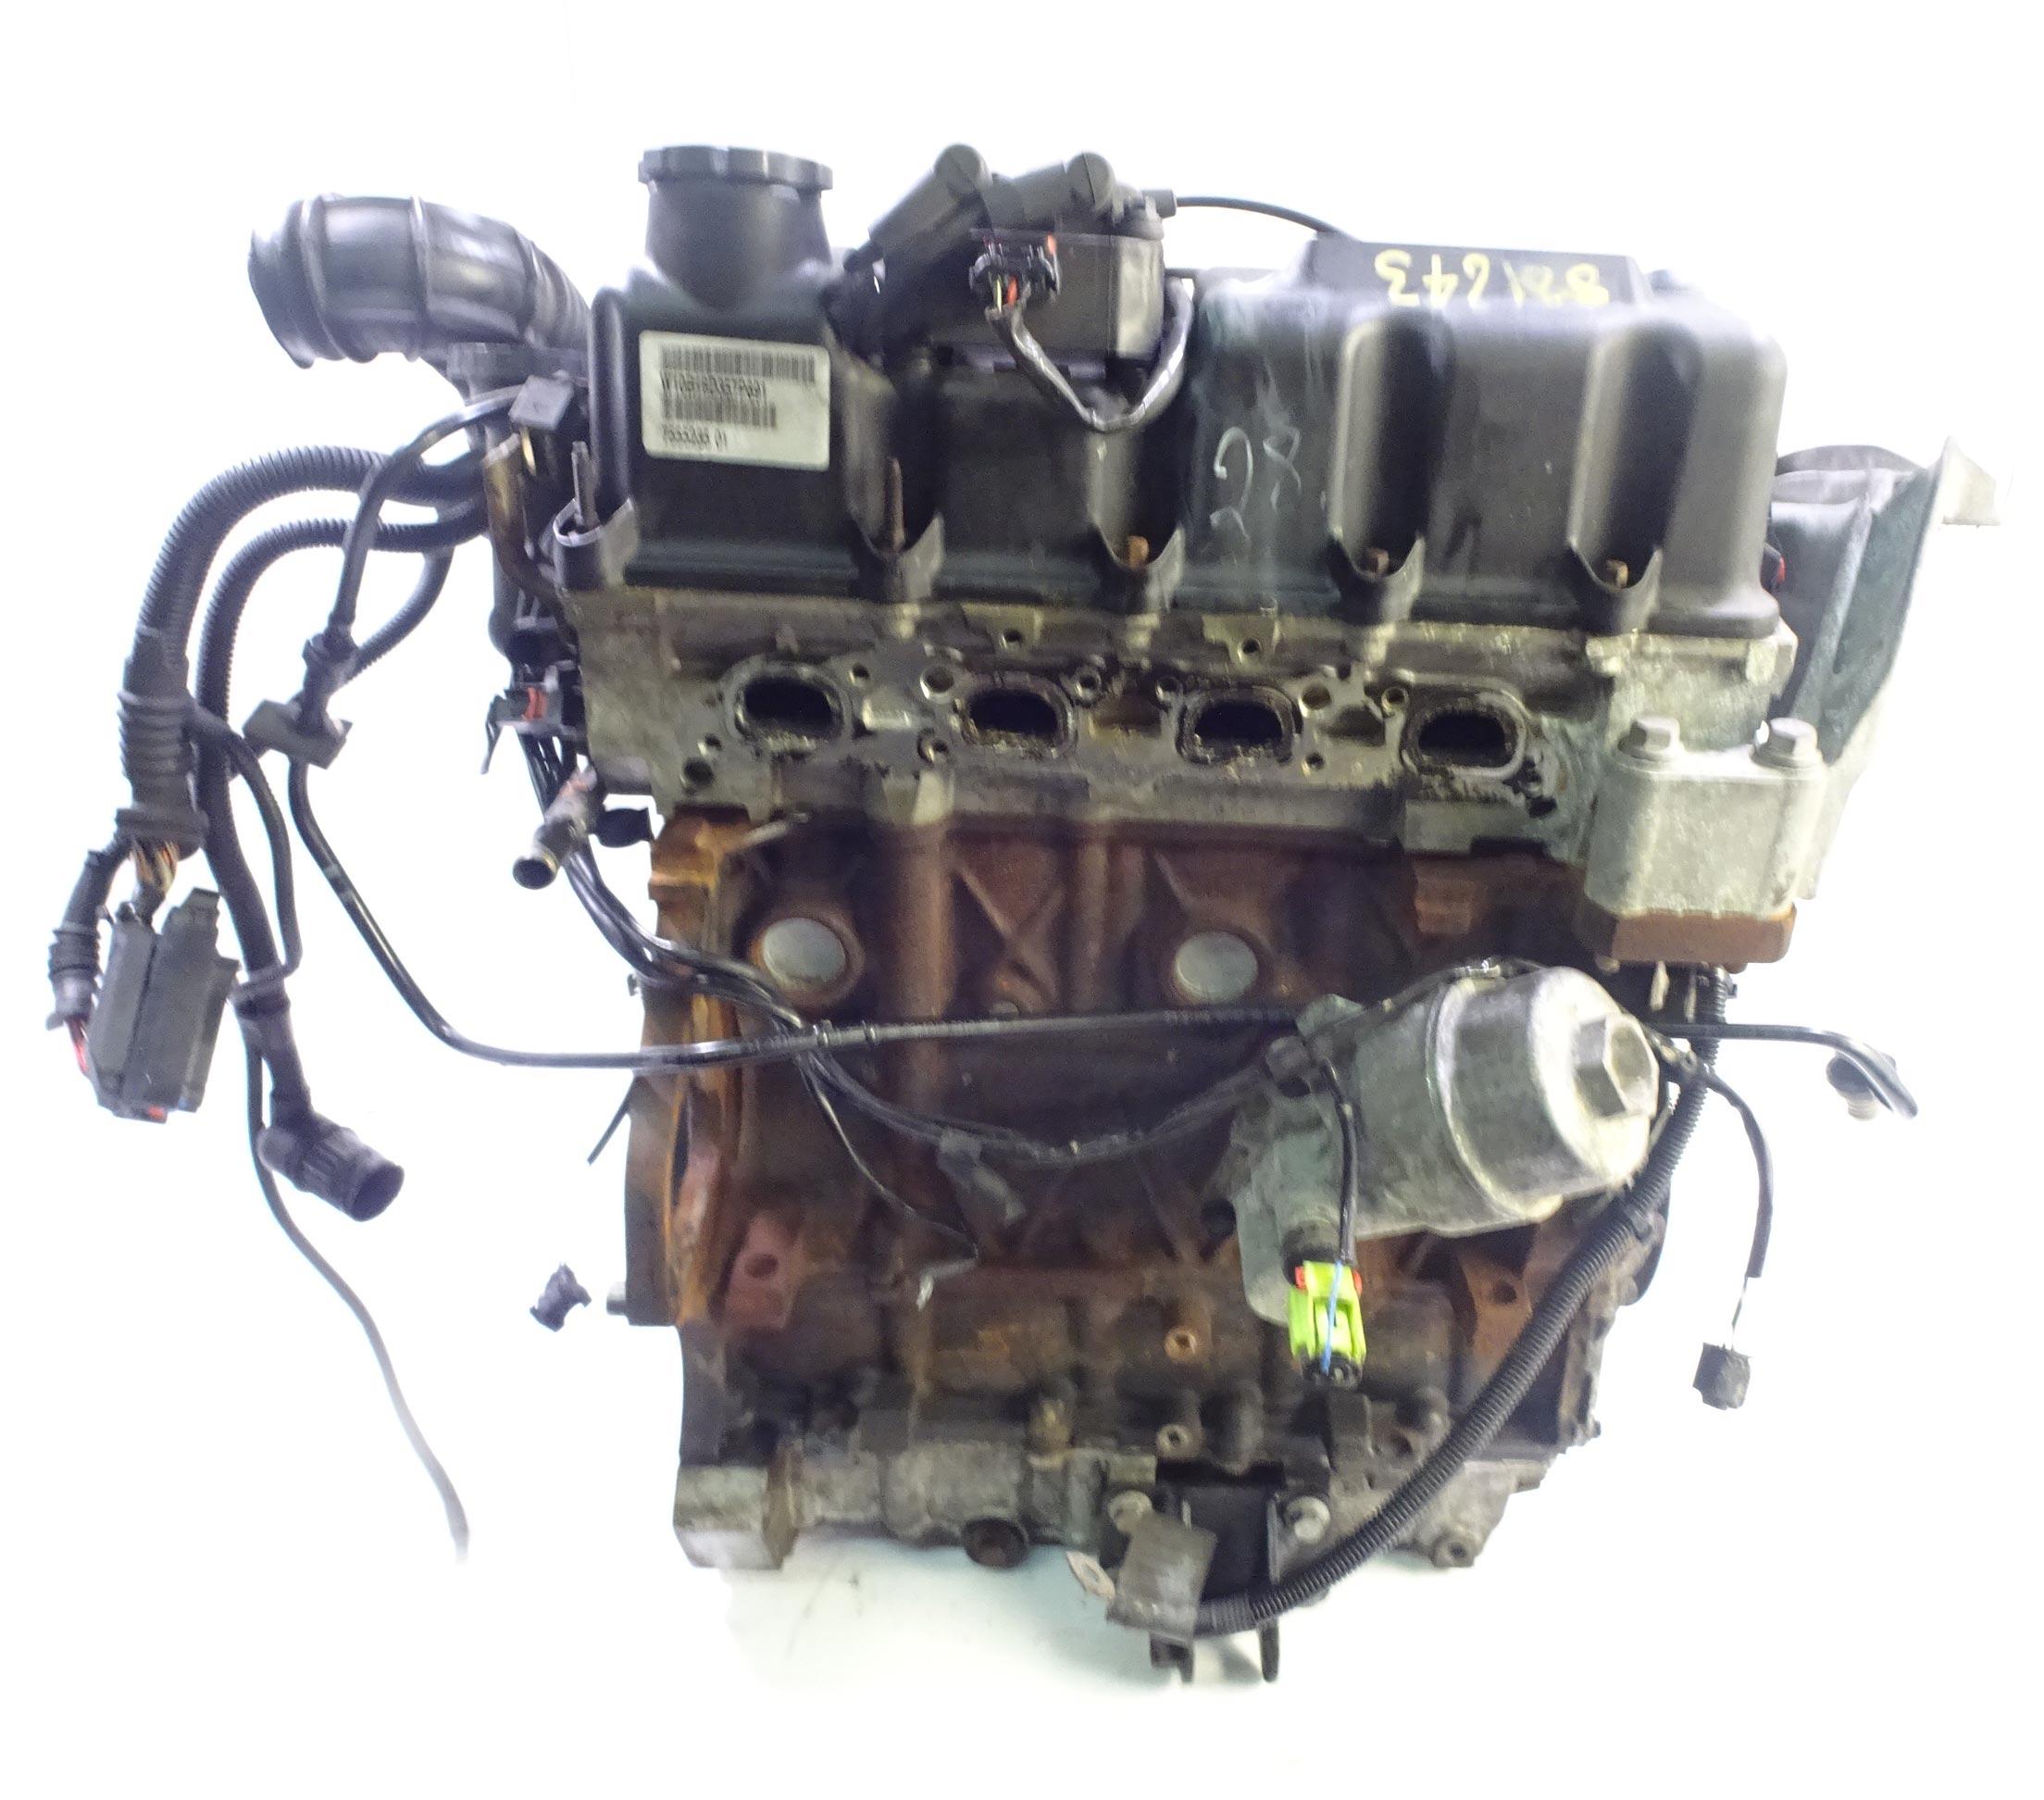 Motor 2006 Mini Cooper R50 R52 R53 1,6 Benzin W10B16A W10B16 mit Anbauteilen